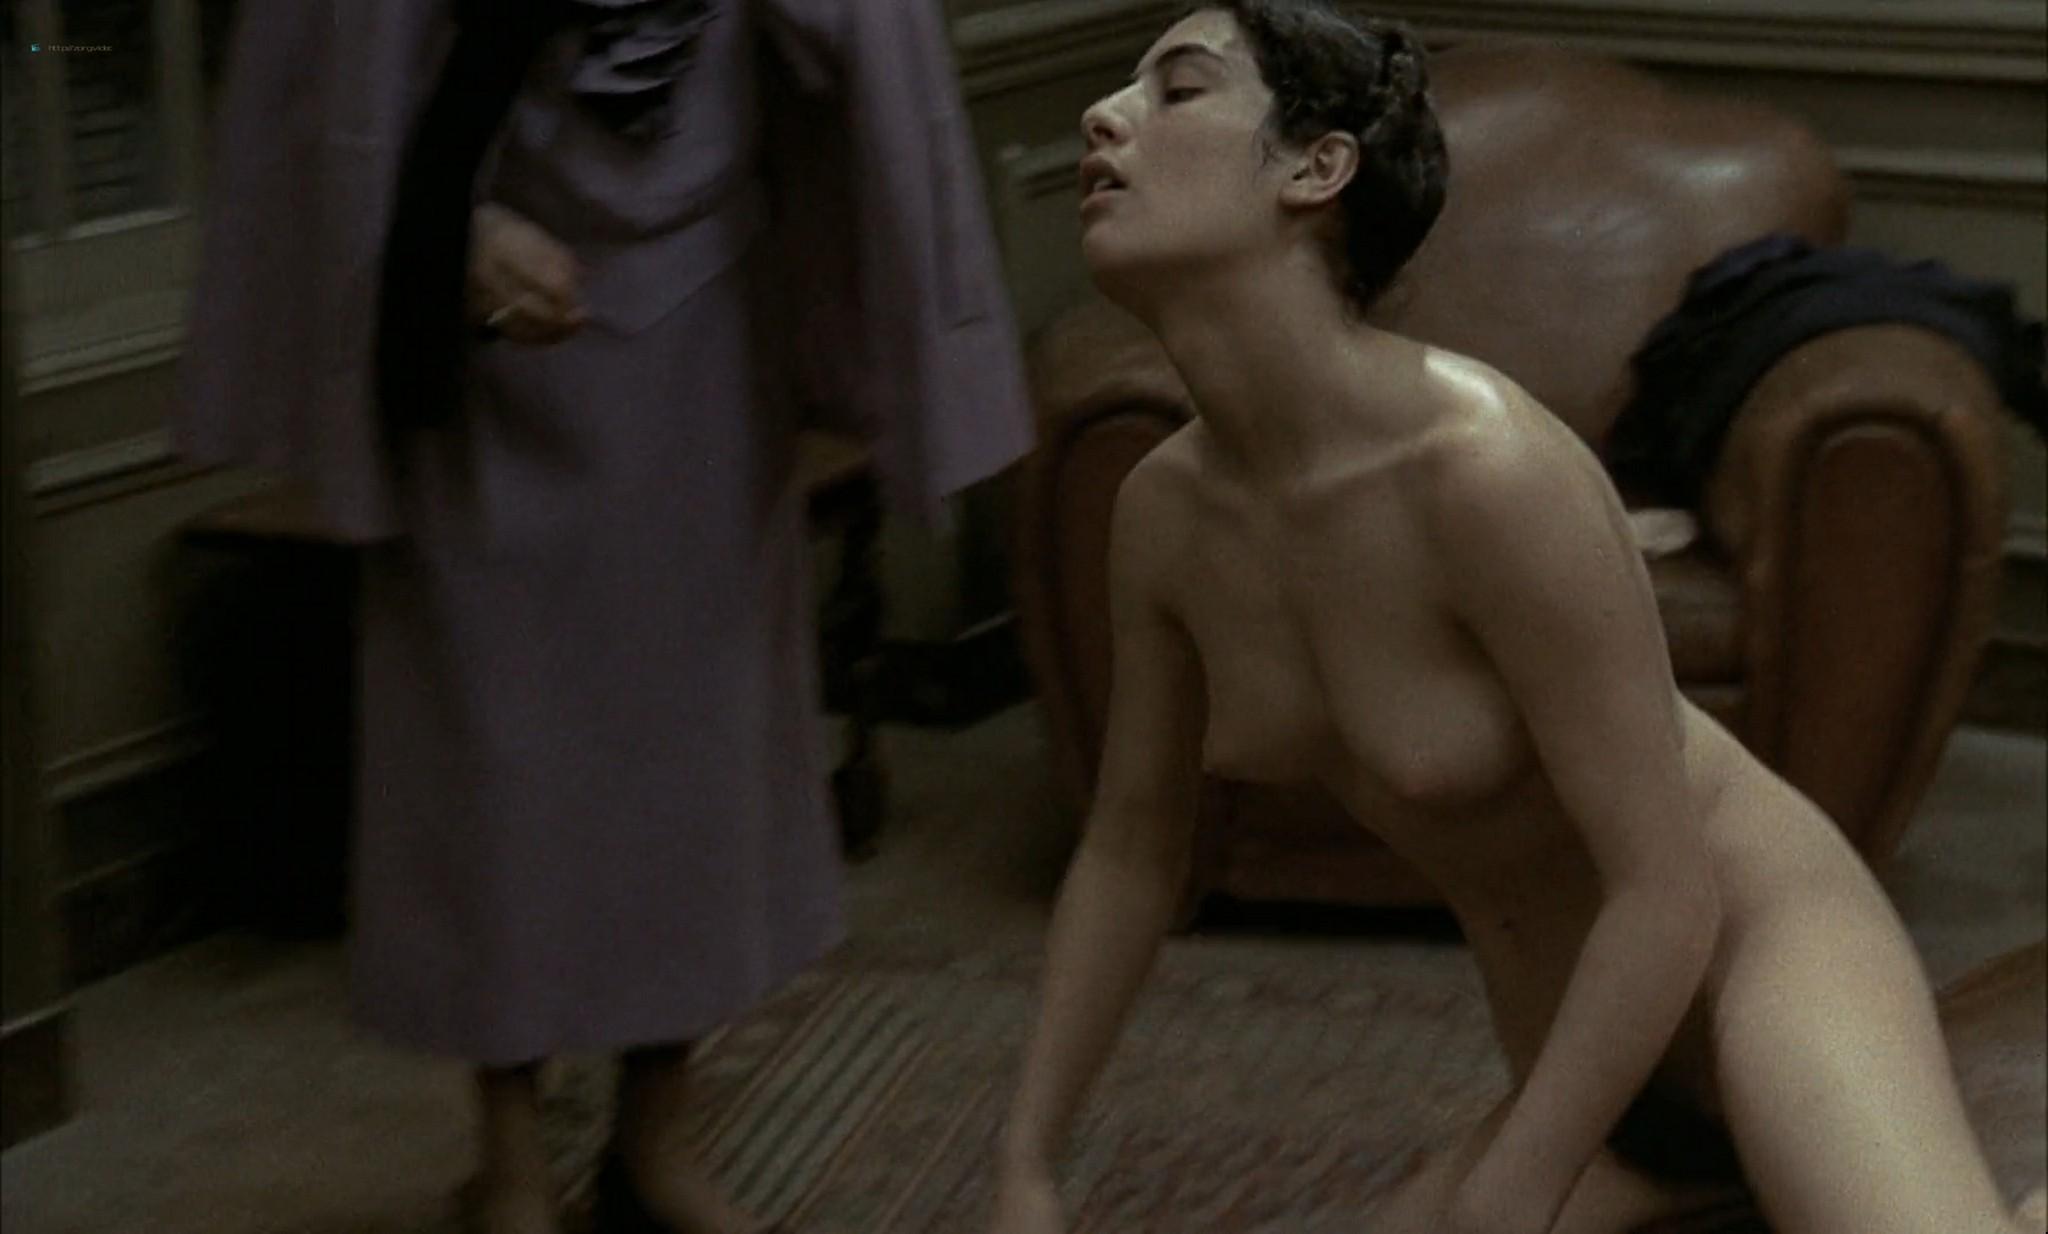 Romy Schneider nude butt Nadia Vasil bush others orgy - L'important c'est d'aimer (FR-1975) HD 1080p BluRay (4)